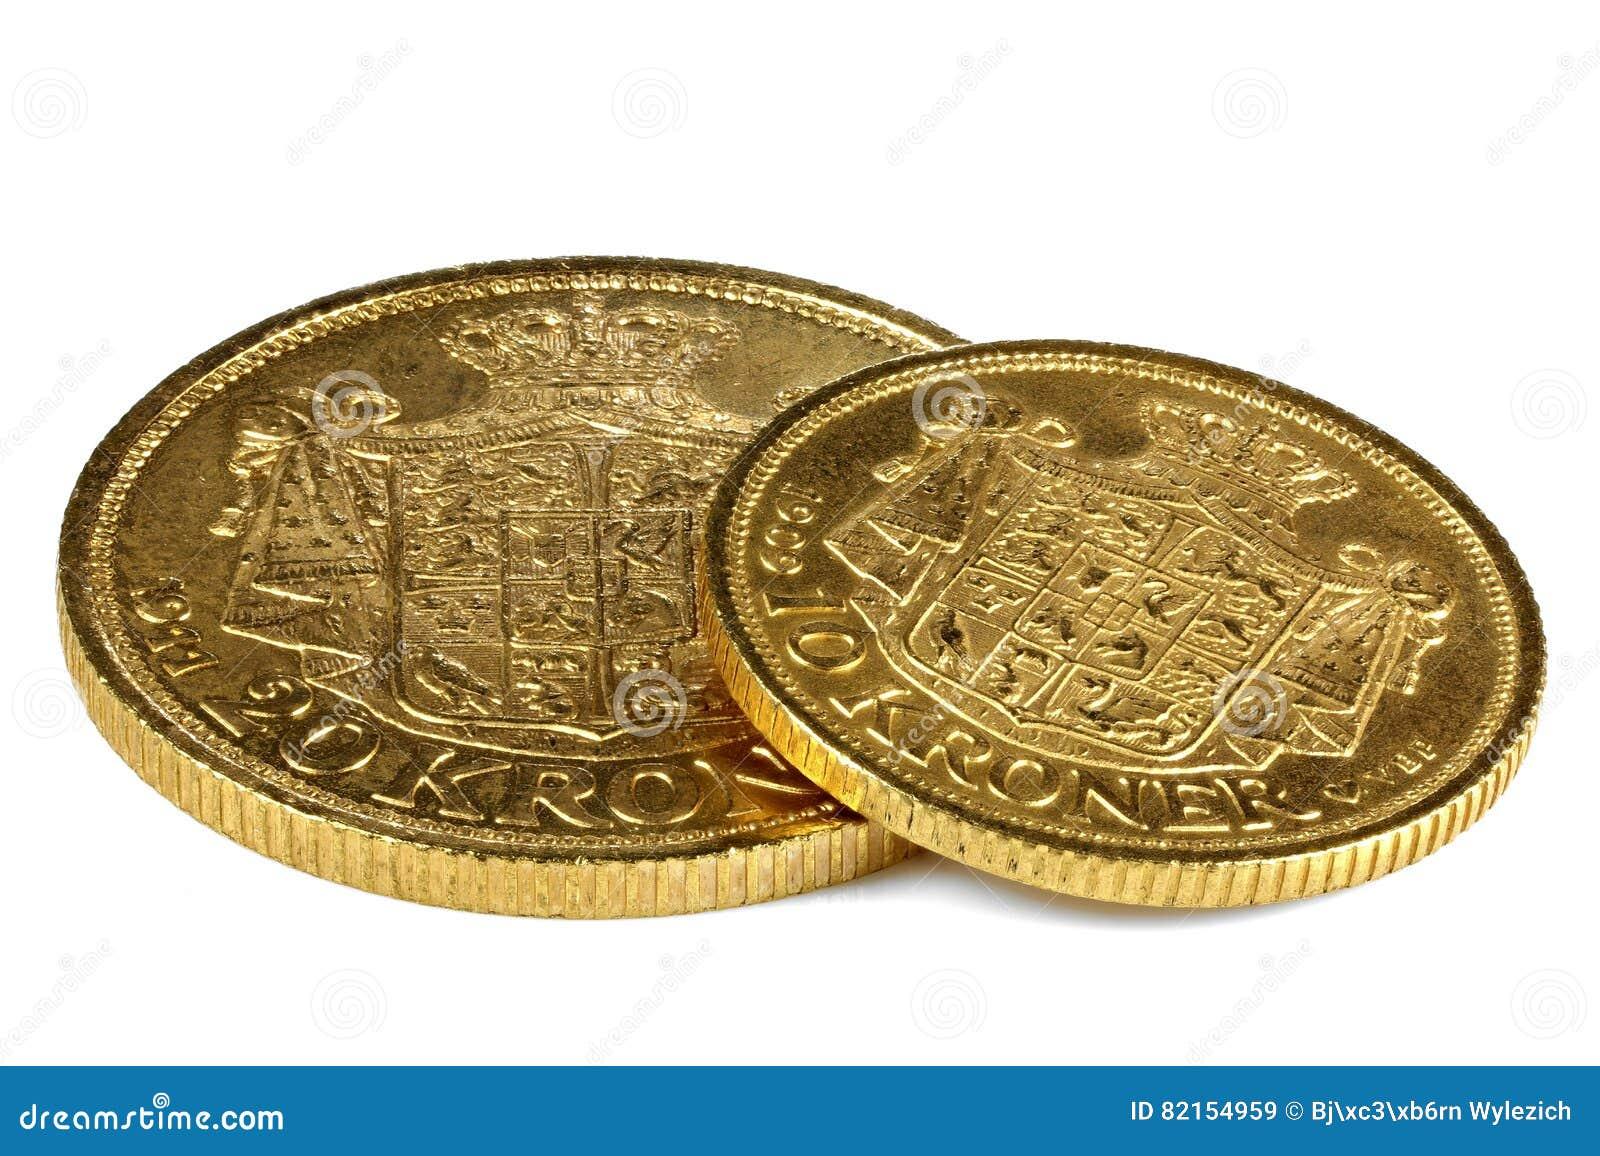 Danish gold coins